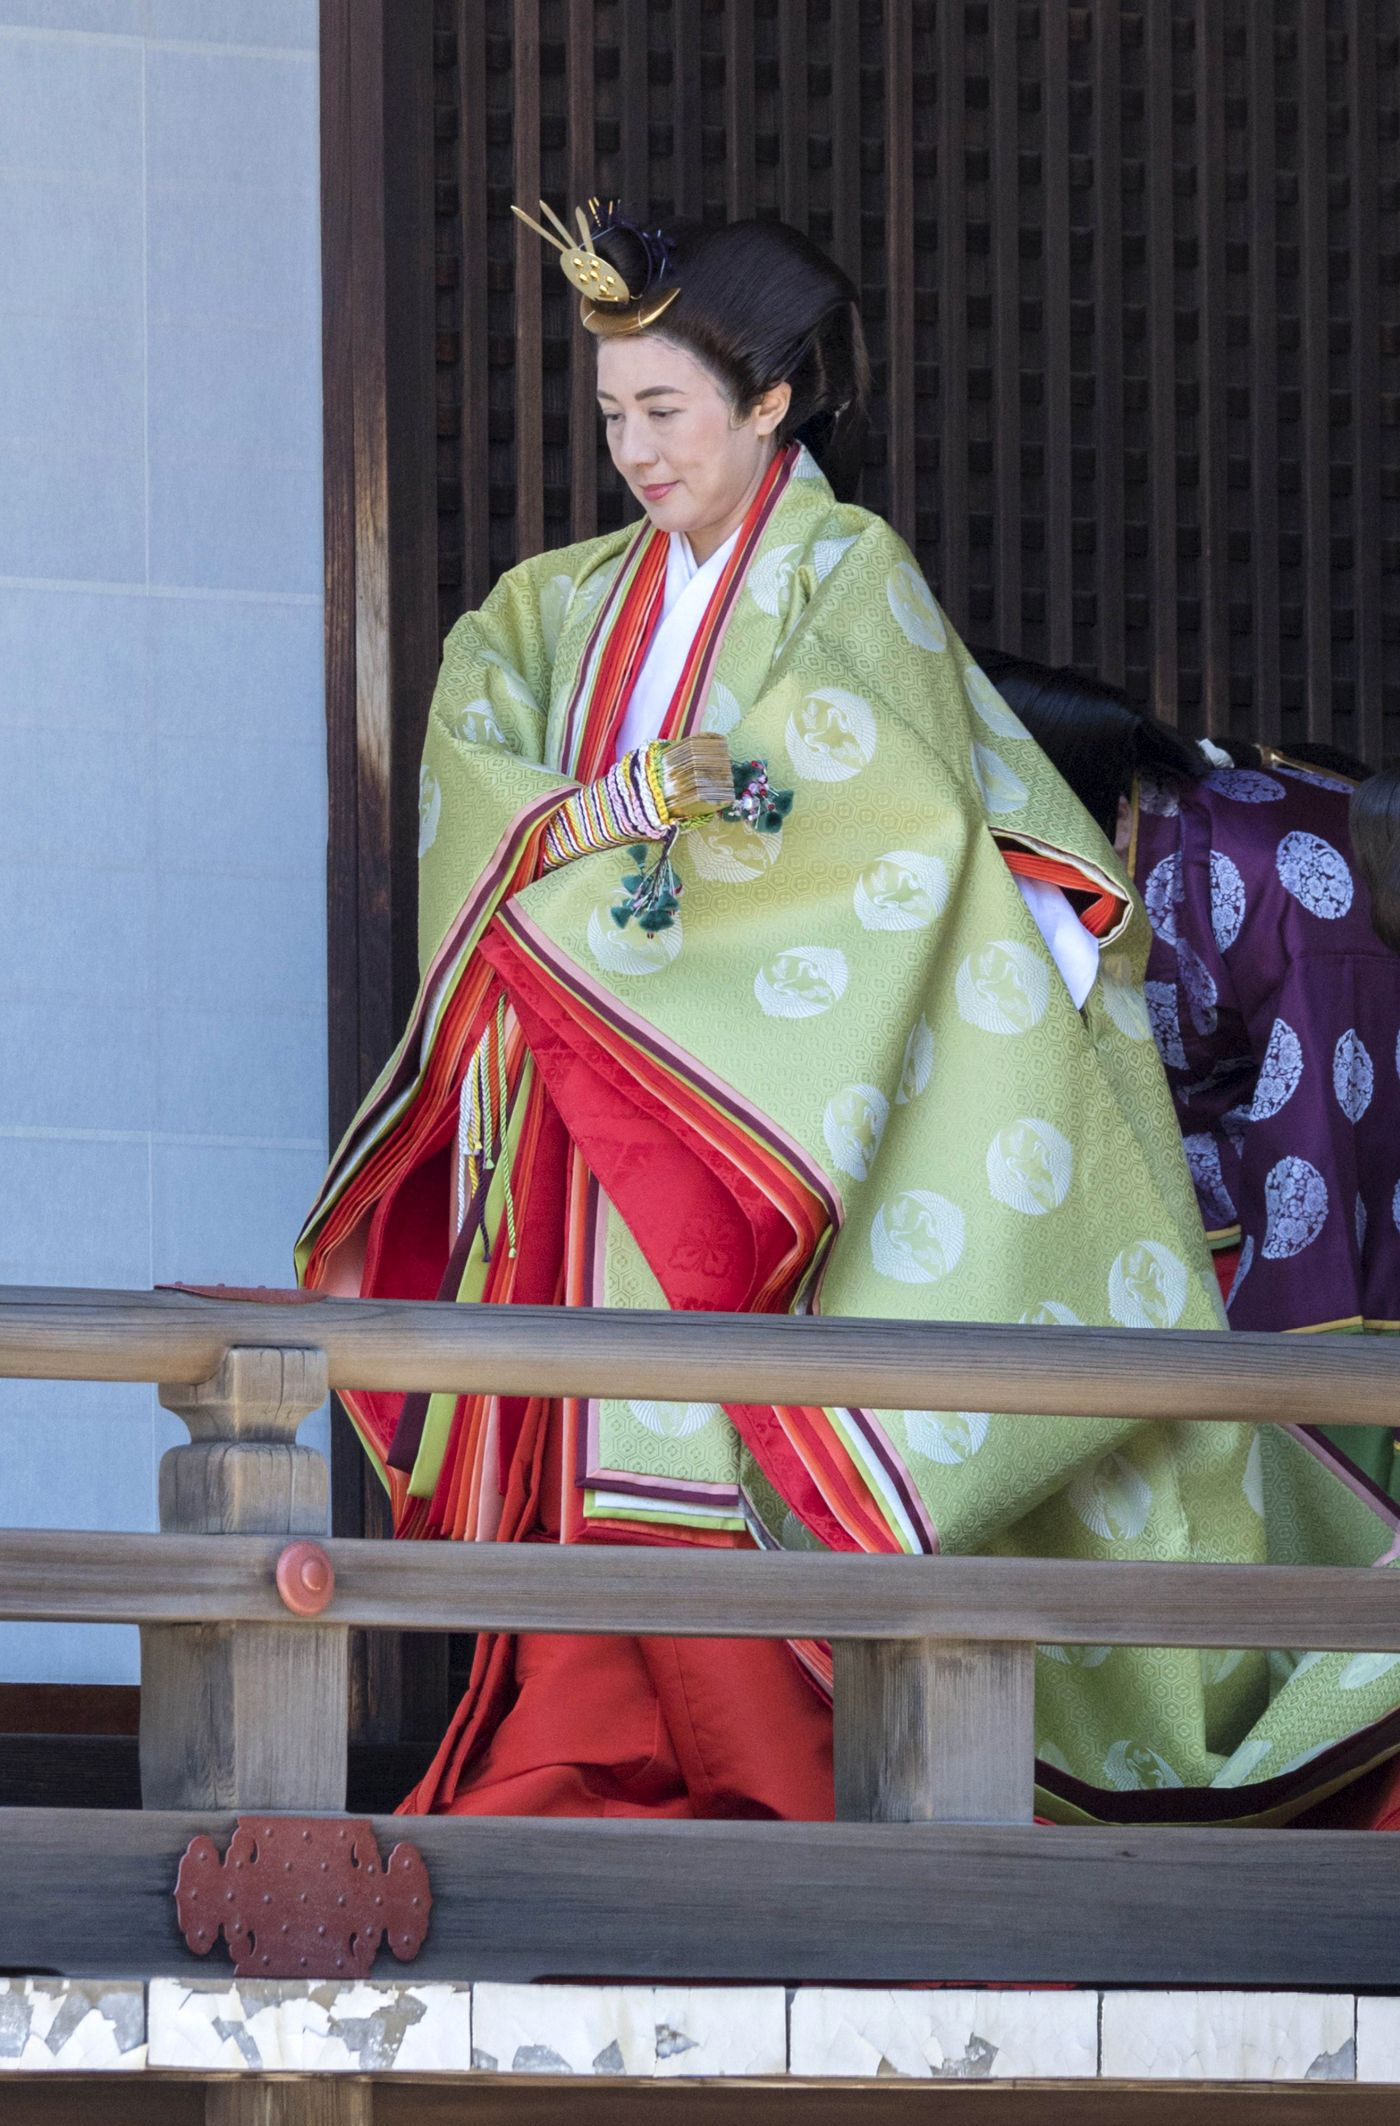 Japan Reiwa Era Emperor Naruhito and Empress Masako 007